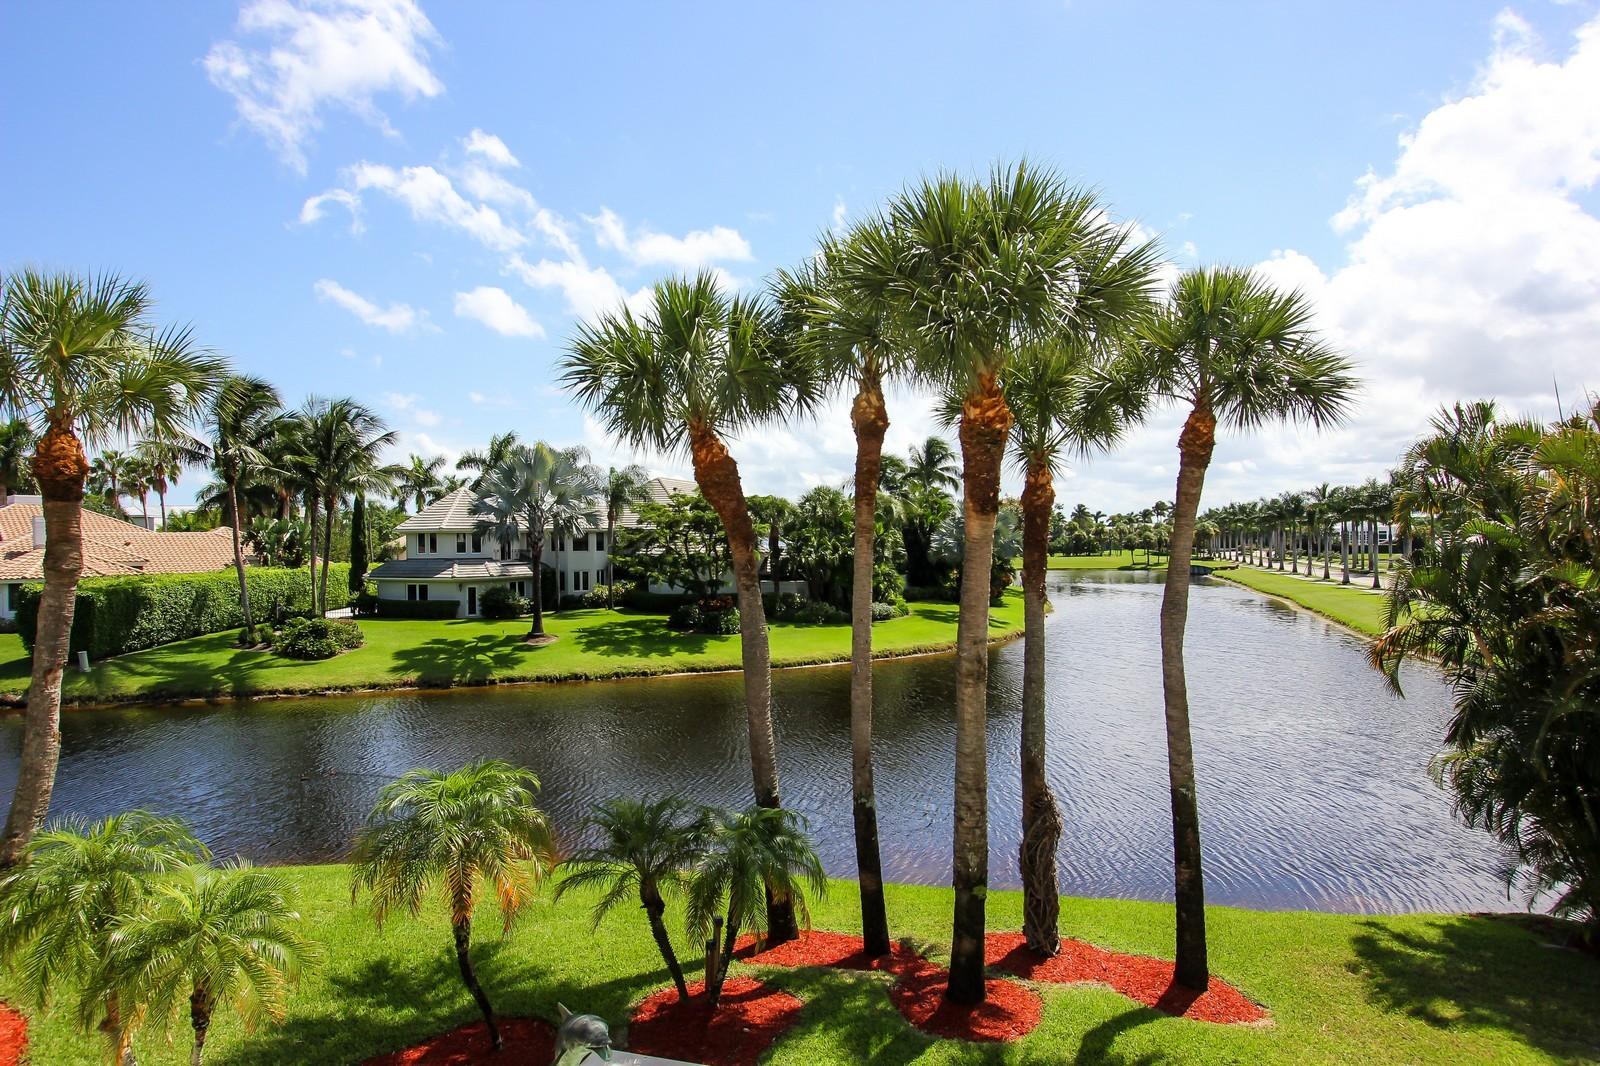 Real Estate Photography - 7015 Ayrshire Ln, Boca Raton, FL, 33496 - Lake View